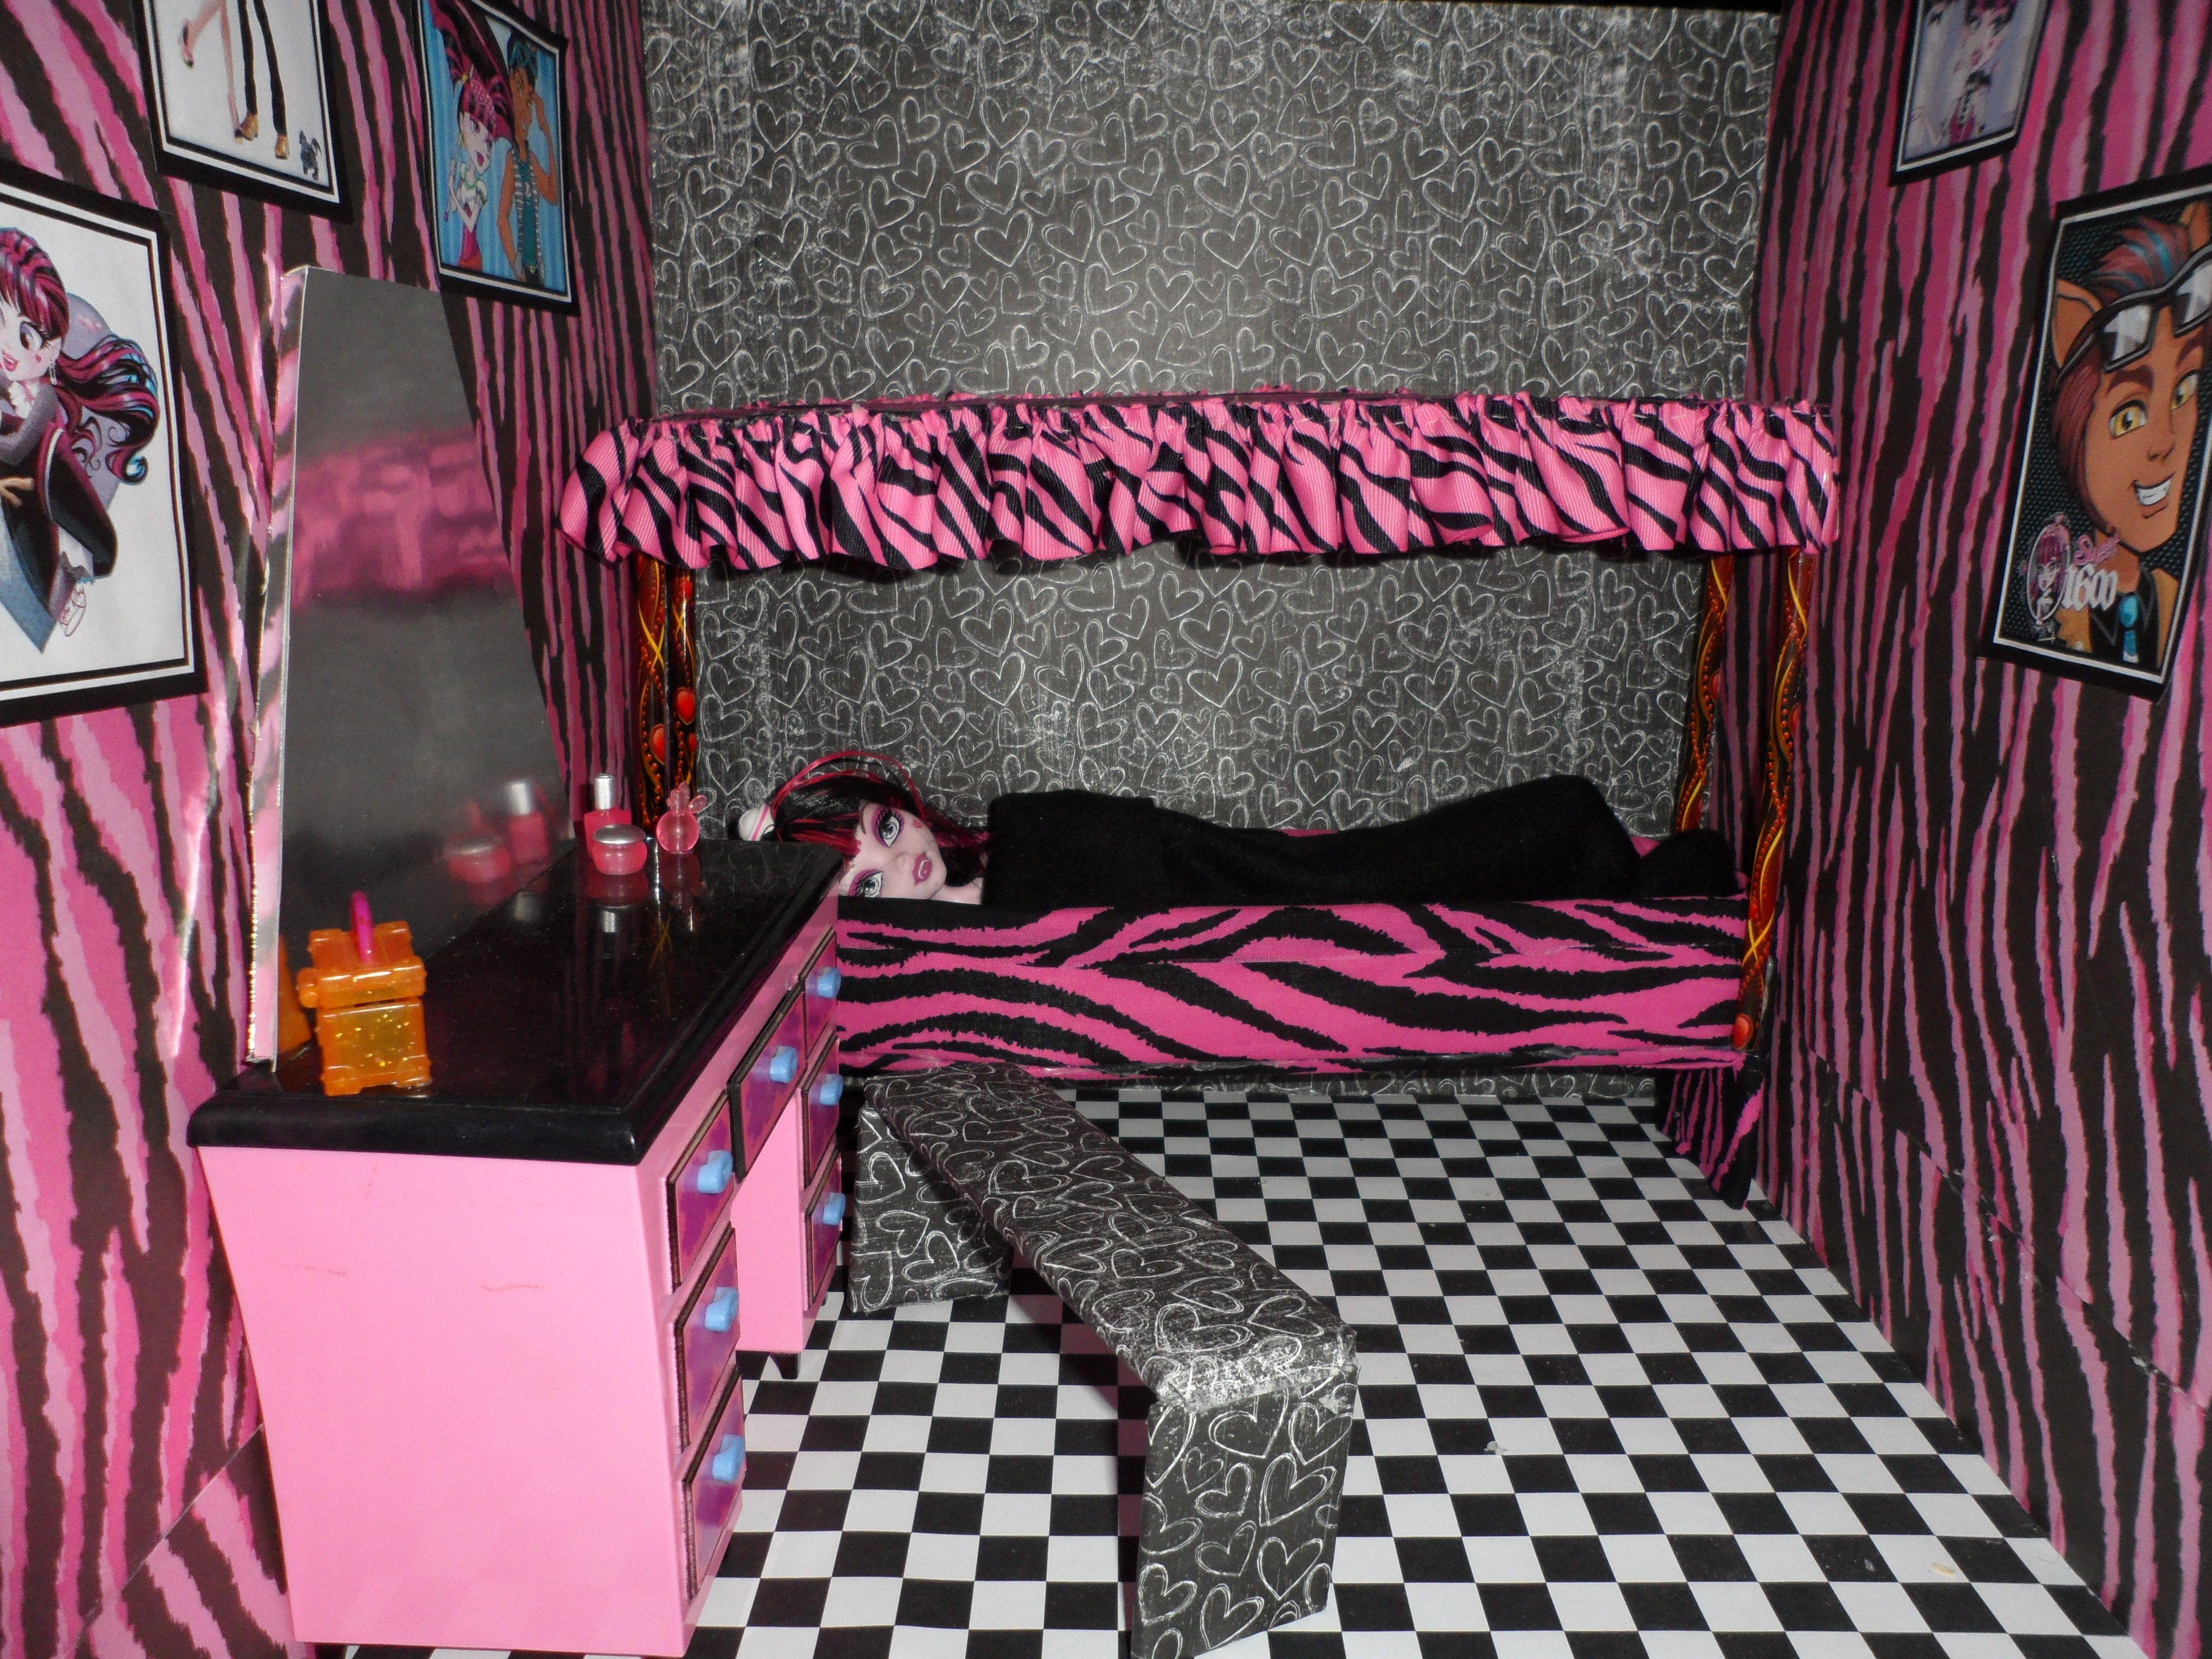 Monster High Bedroom Decorations Similiar Monster High Room Keywords